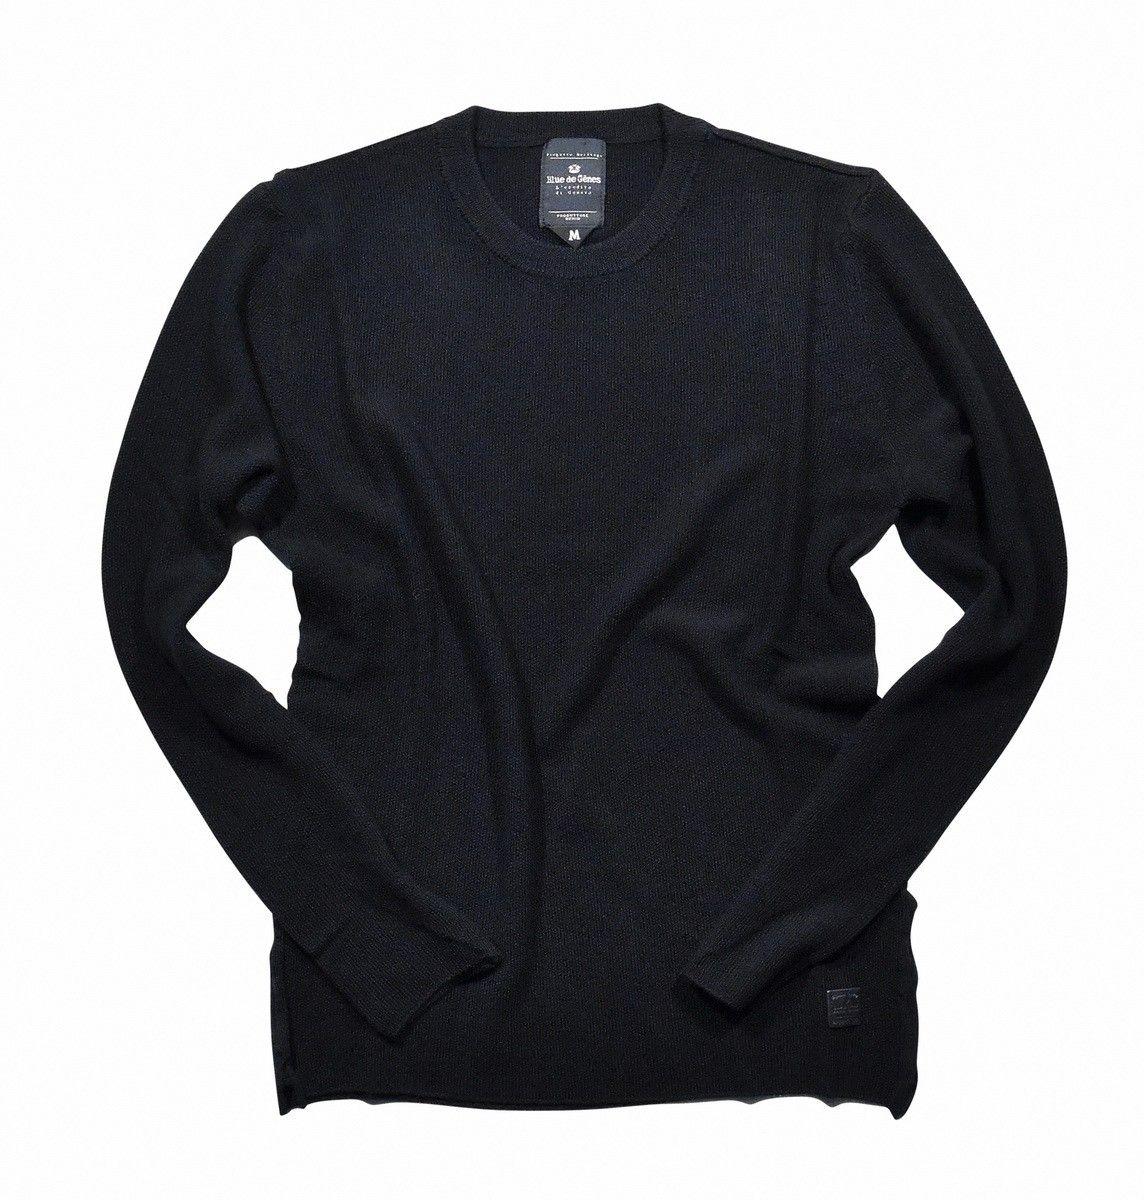 BLUE DE GÊNES - Herren Pullover - Tondo Knit - Black